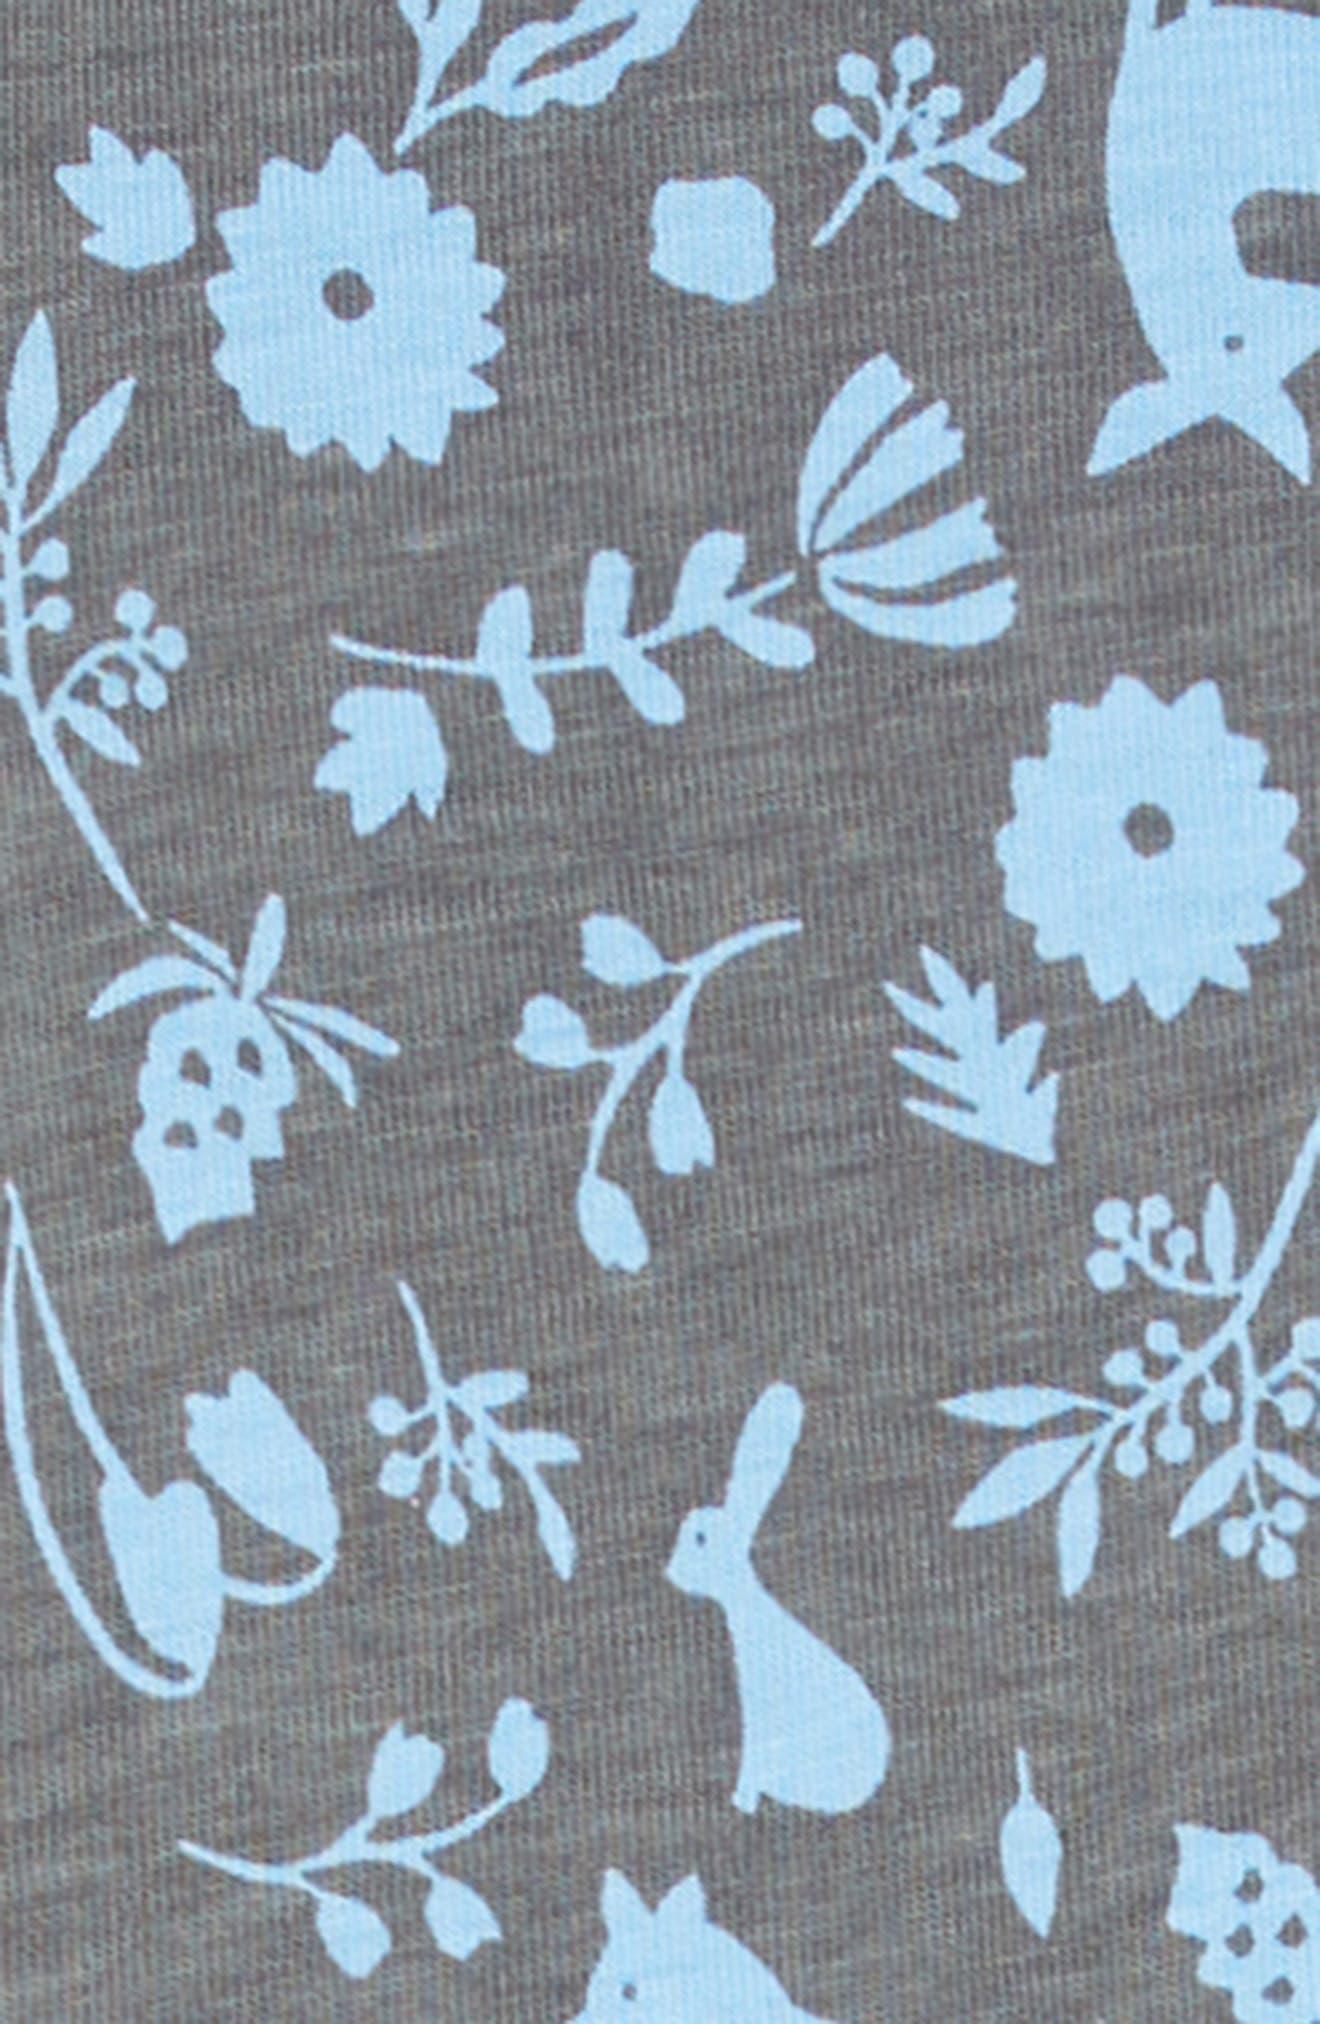 Sparkle Henley Dress,                             Alternate thumbnail 3, color,                             DESERT FLORA AND FAUNA